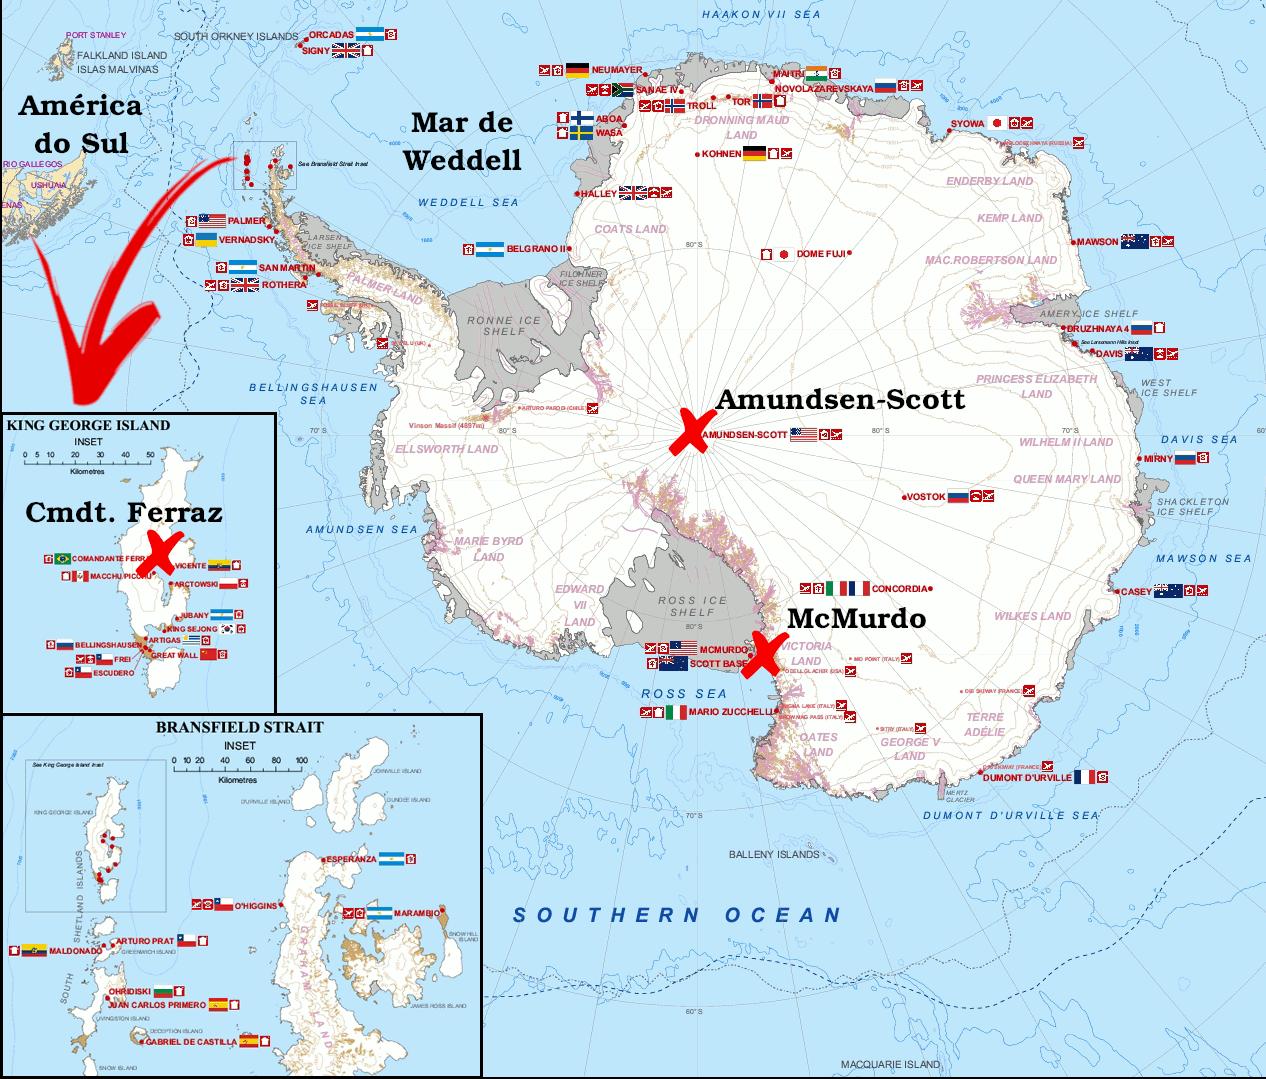 Mapa da Antártida, com destaque para o Mar de Weddel, base Comandante Ferraz na Ilha Rei George, base McMurdo e base Amundsen-Scott, no polo sul geográfico. Adaptado de Wikipedia